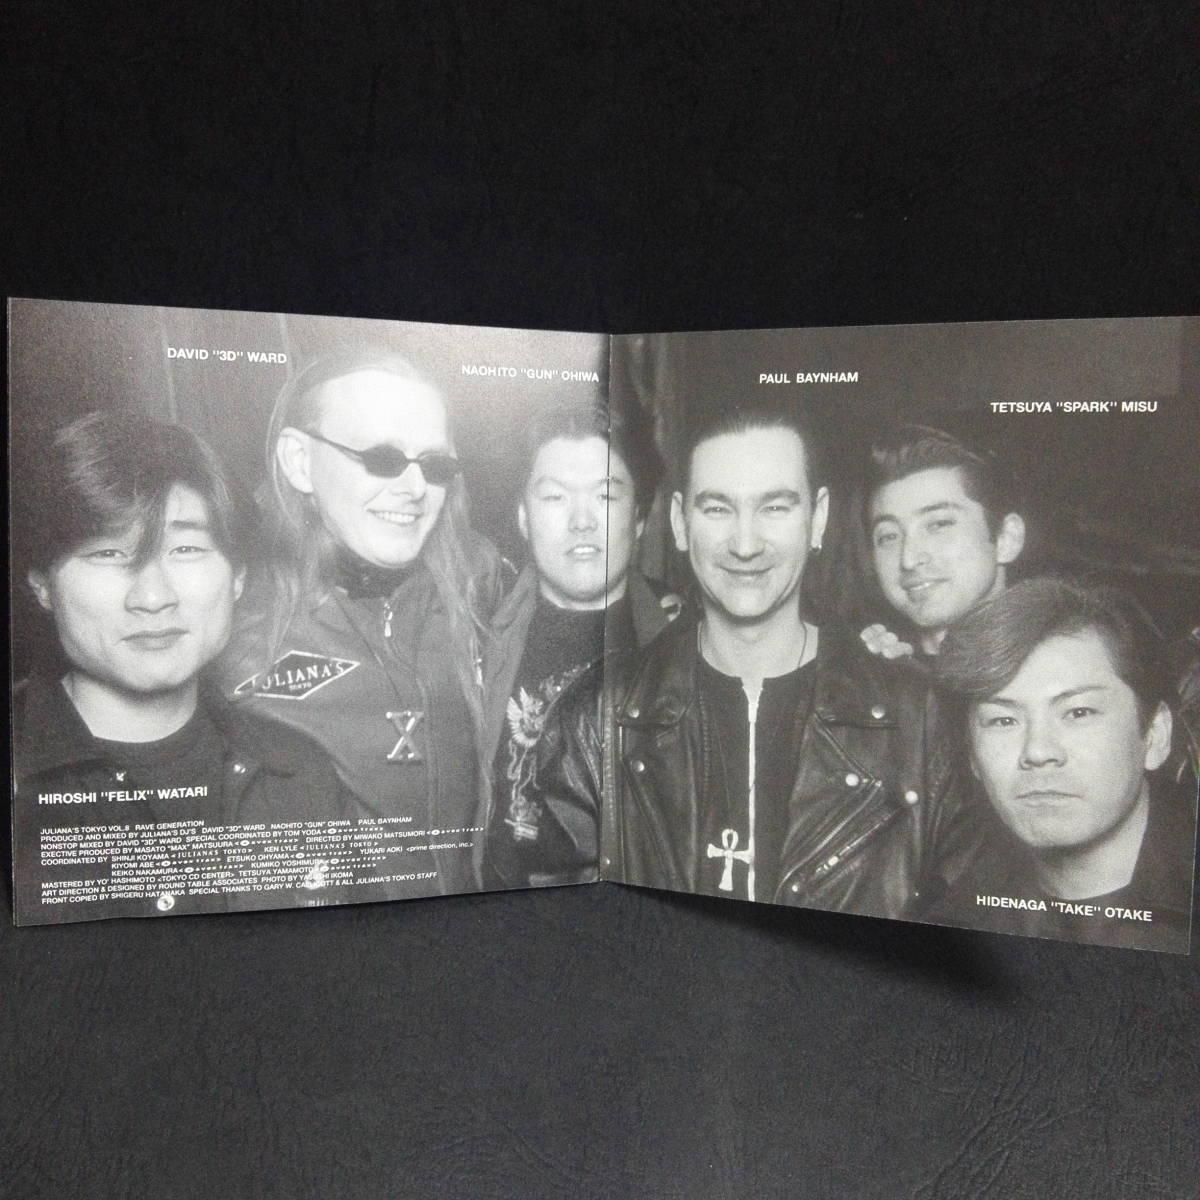 JULIANA'S TOKYO Vol.8 ジュリアナ 東京 90s ディスコ DISCO ジョンロビンソン John Robinson 2ND FUNK-TION L.A.STYLE RAVEMAN Fargetta_画像7